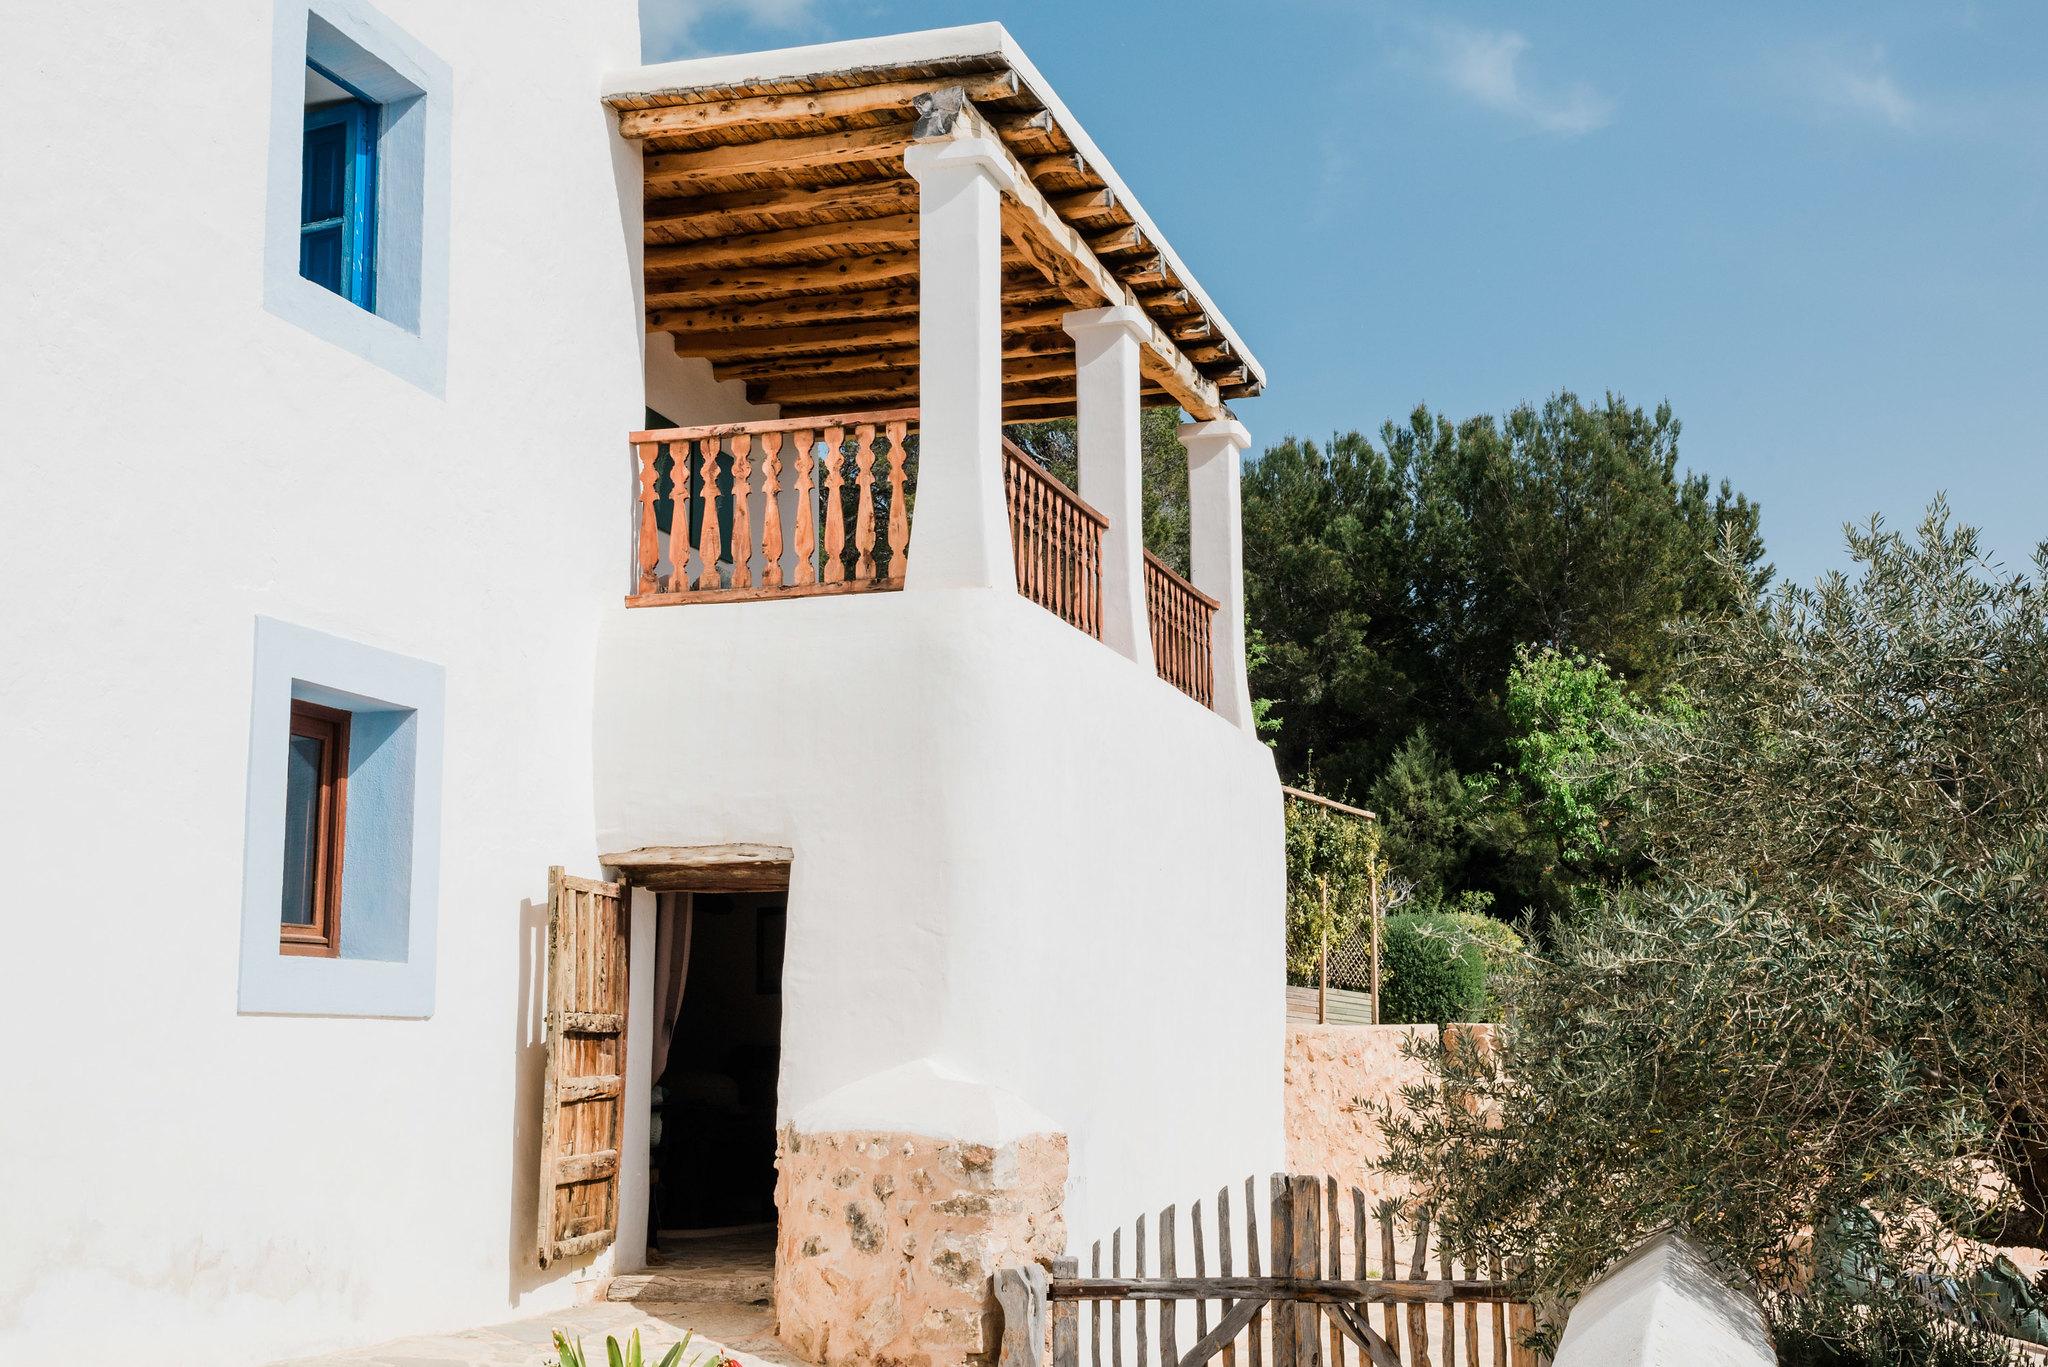 https://www.white-ibiza.com/wp-content/uploads/2020/06/white-ibiza-villas-los-corrales-exterior-facade.jpg